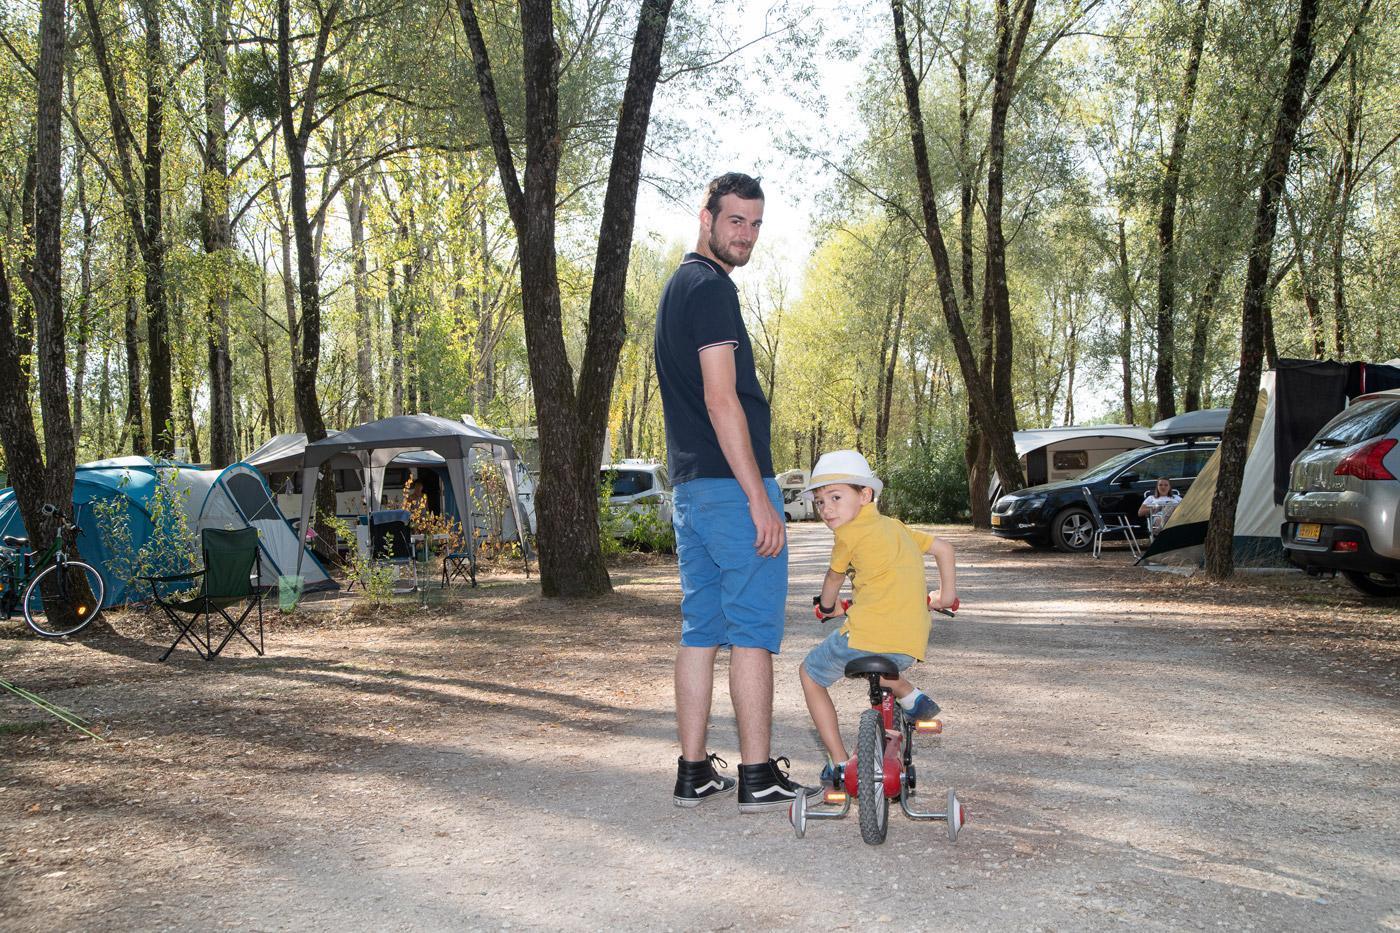 Camping Sites Et Paysages Les Saules Cheverny Velo